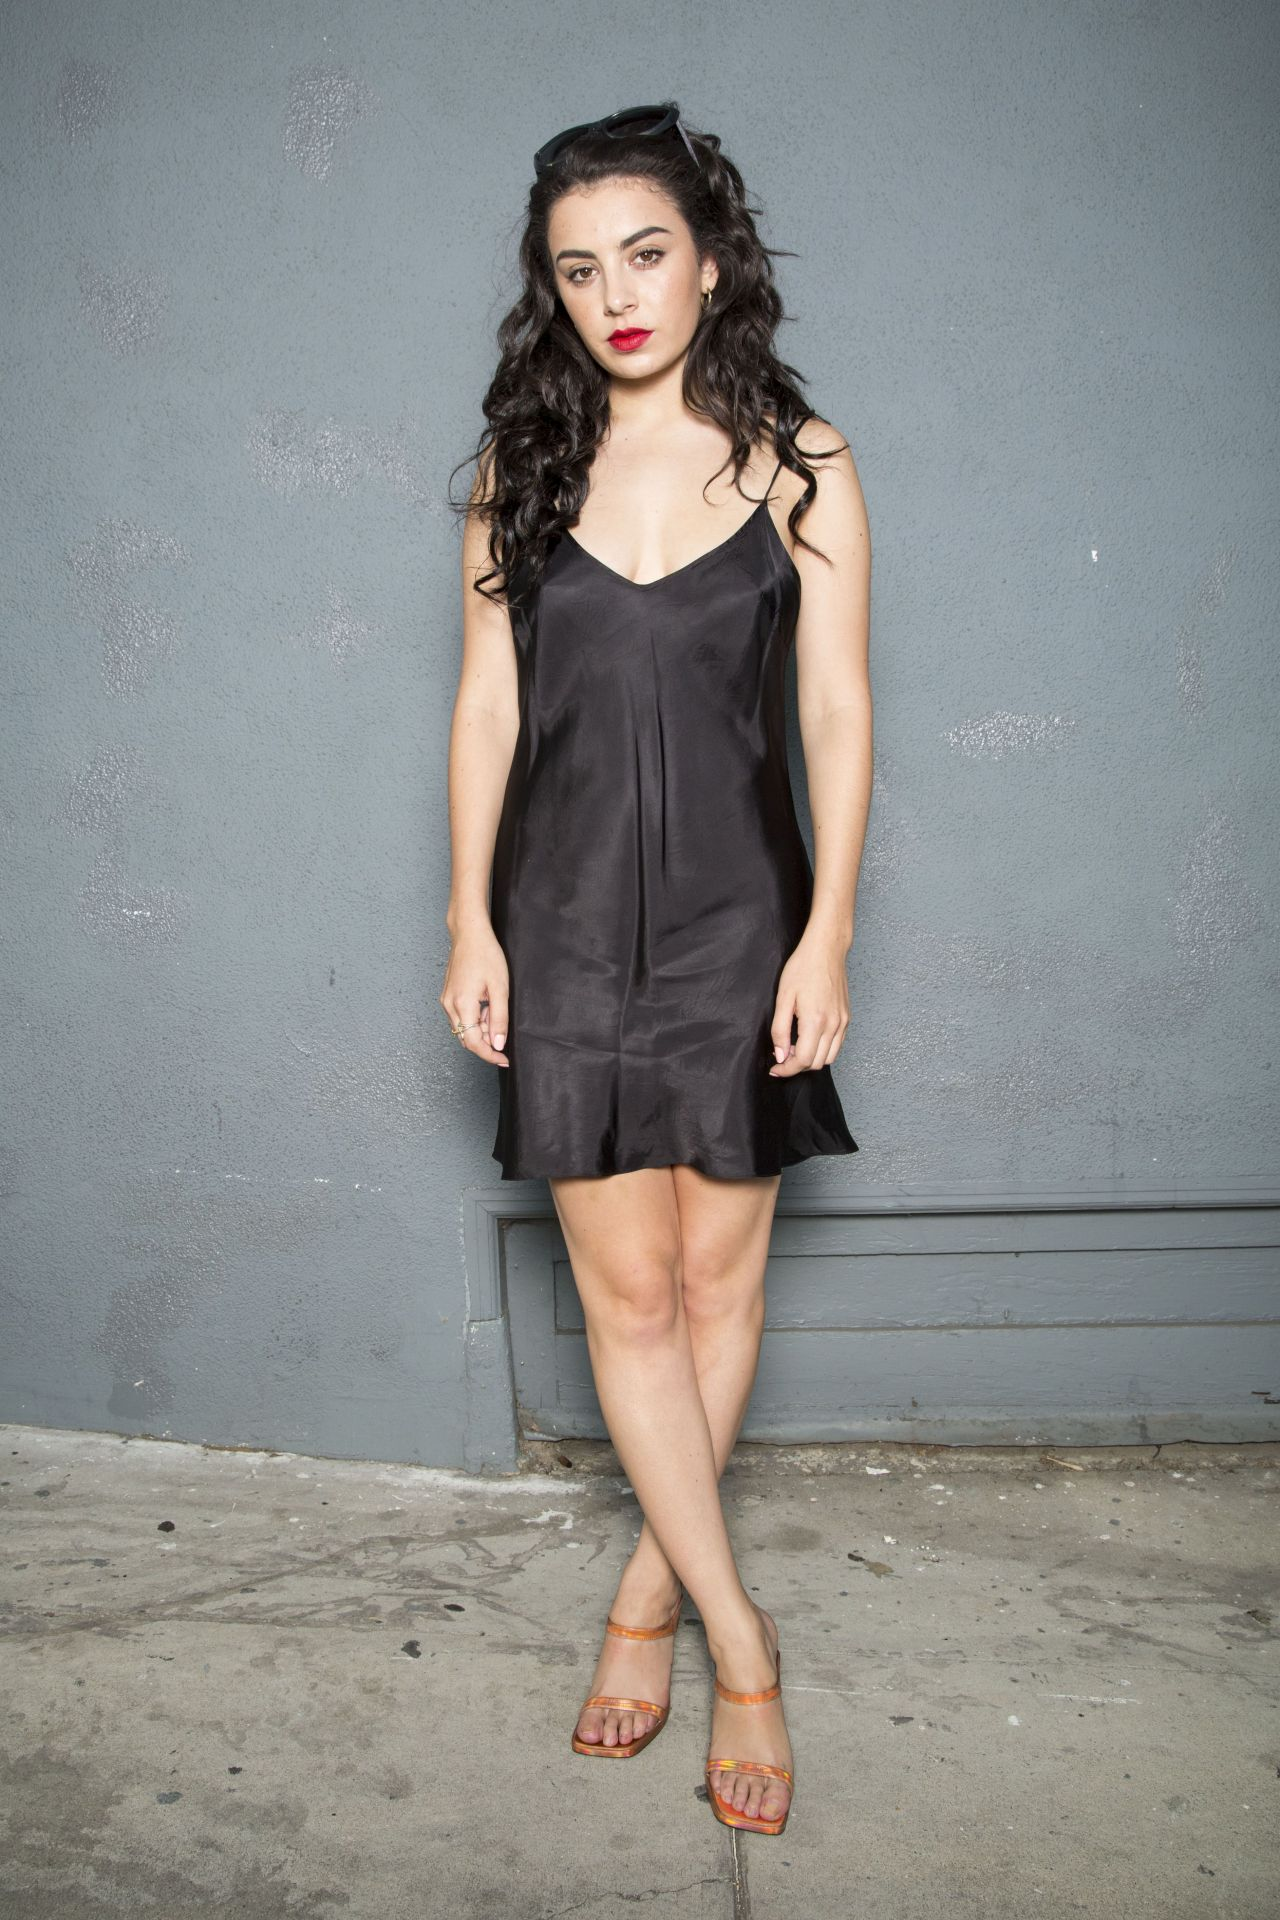 Charli Xcx Photoshoot 2014